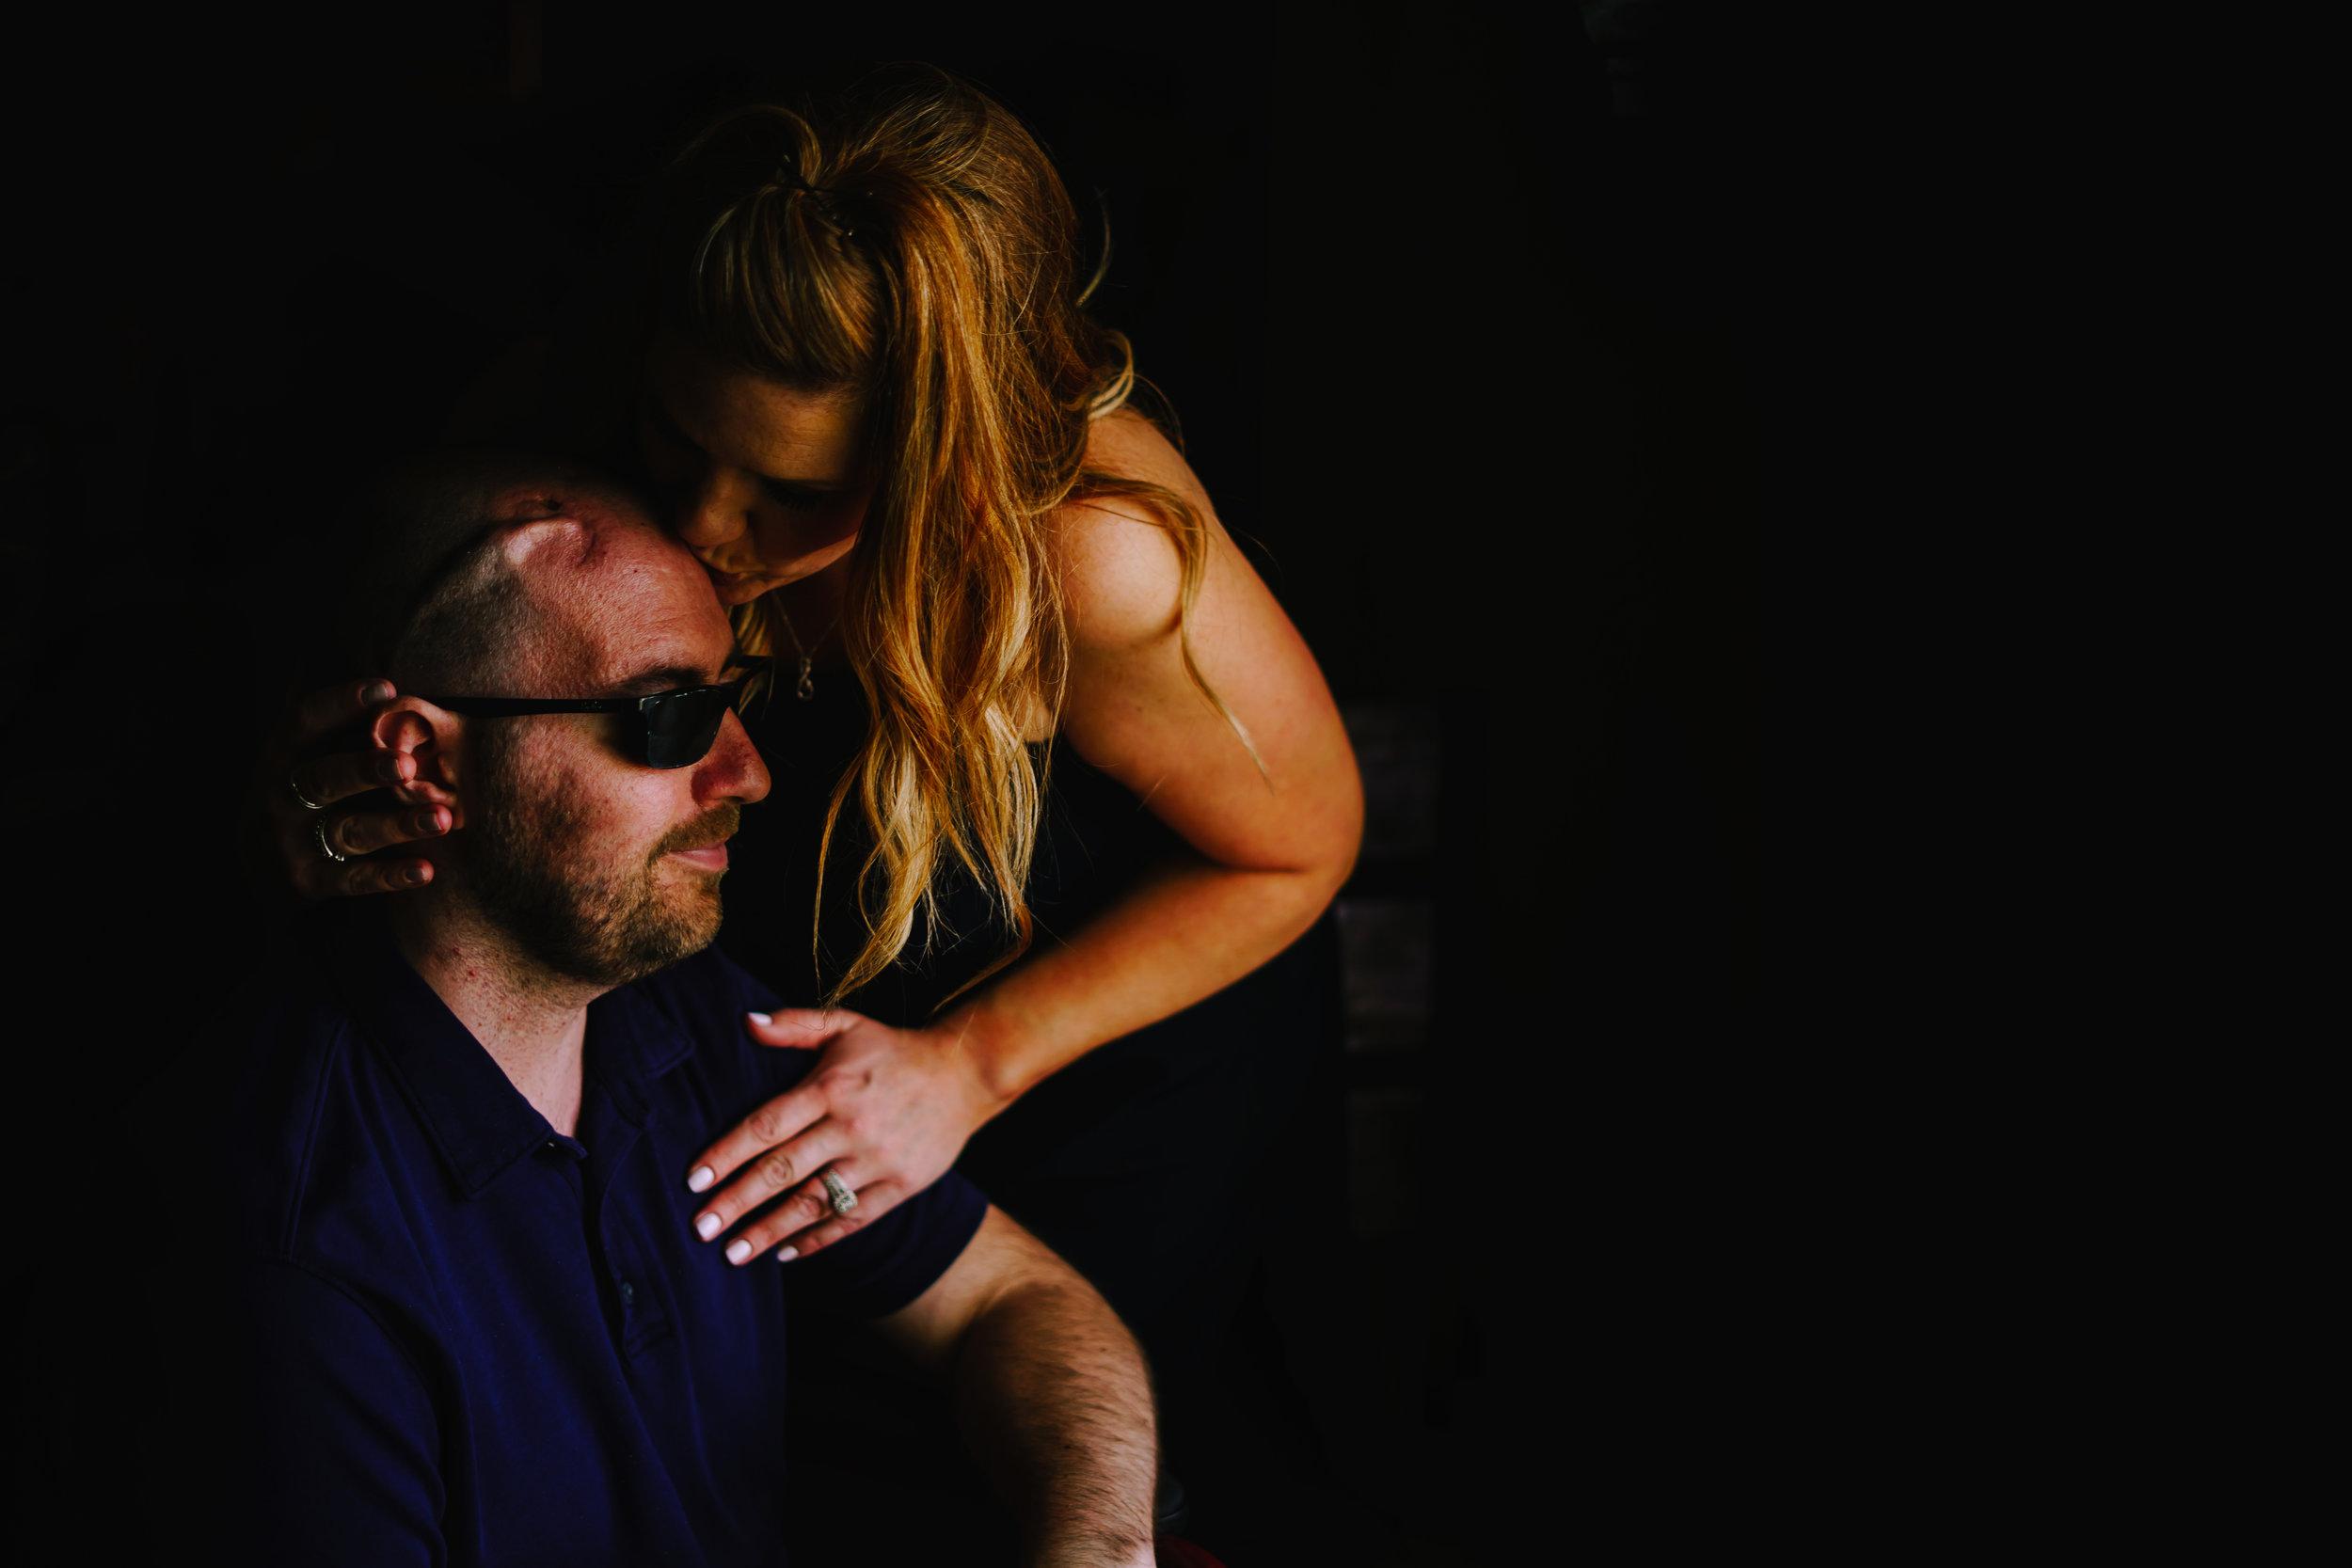 Dan-coghlan-powerful-terminally-ill-photographs-brain-cancer34.jpg